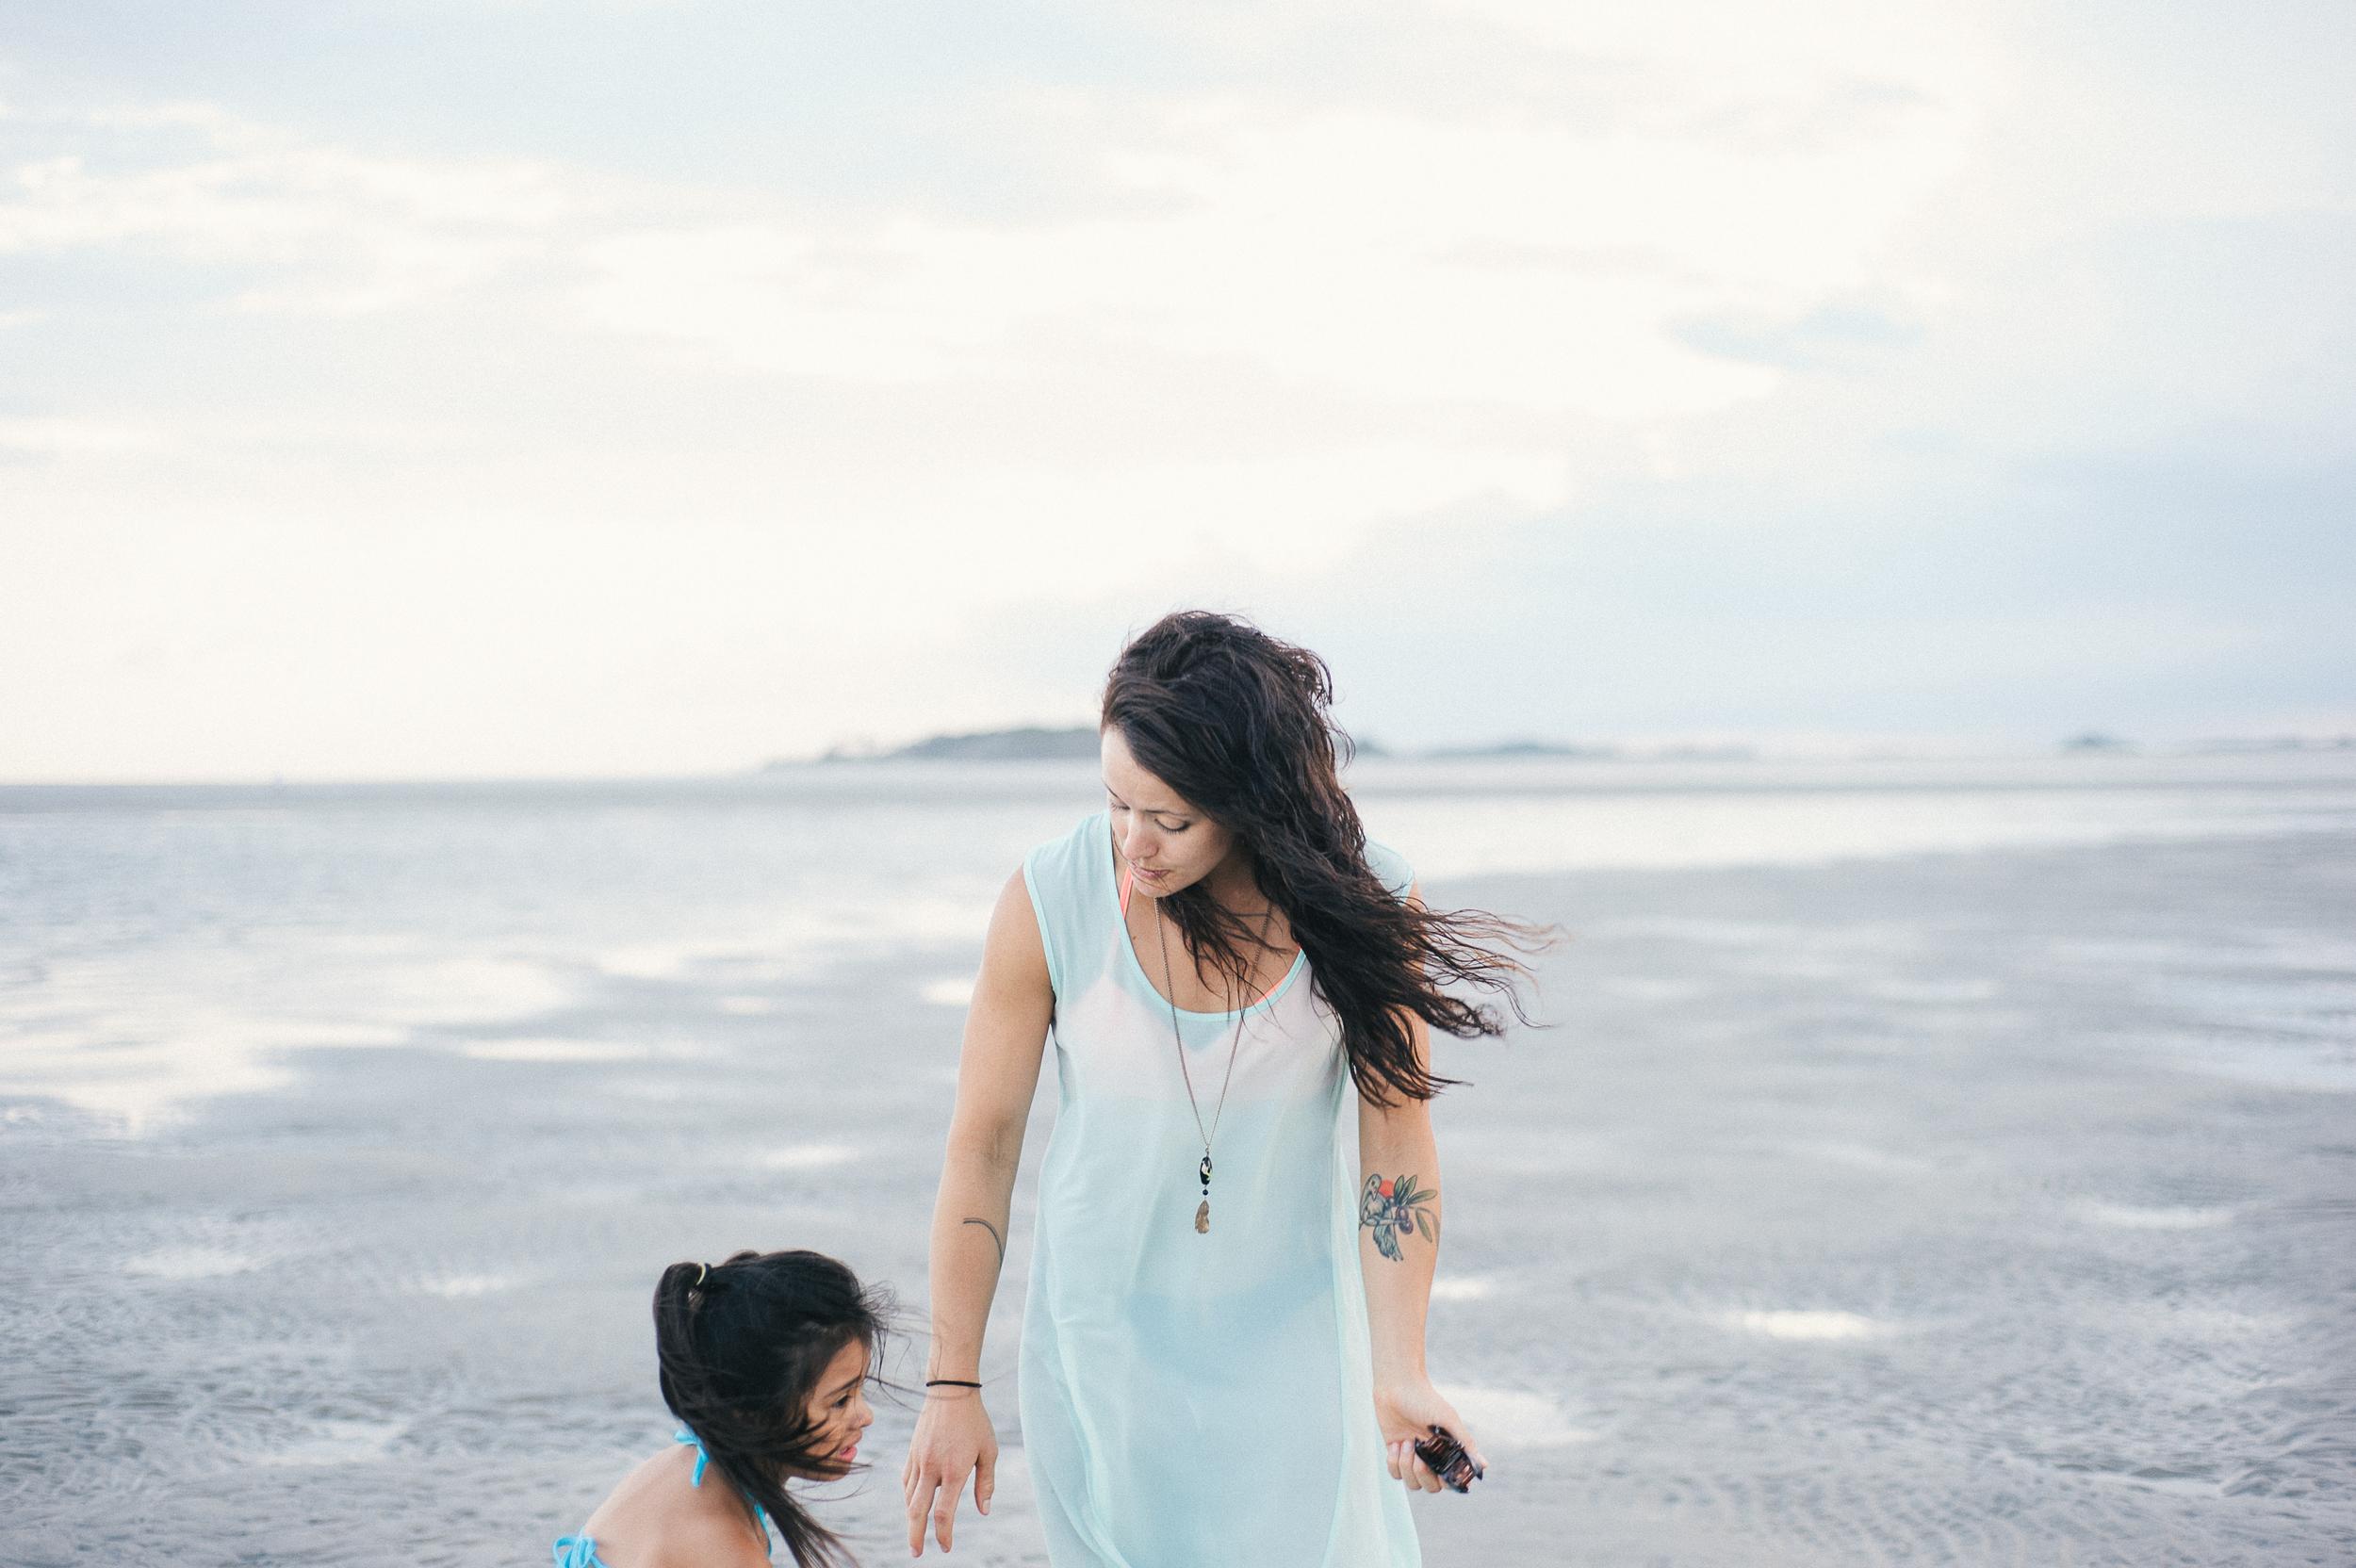 m.newsom-photography-savannah-wedding-photographer-tybee-island-photographer-kami-and-petra-july-2015 (48 of 230).jpg